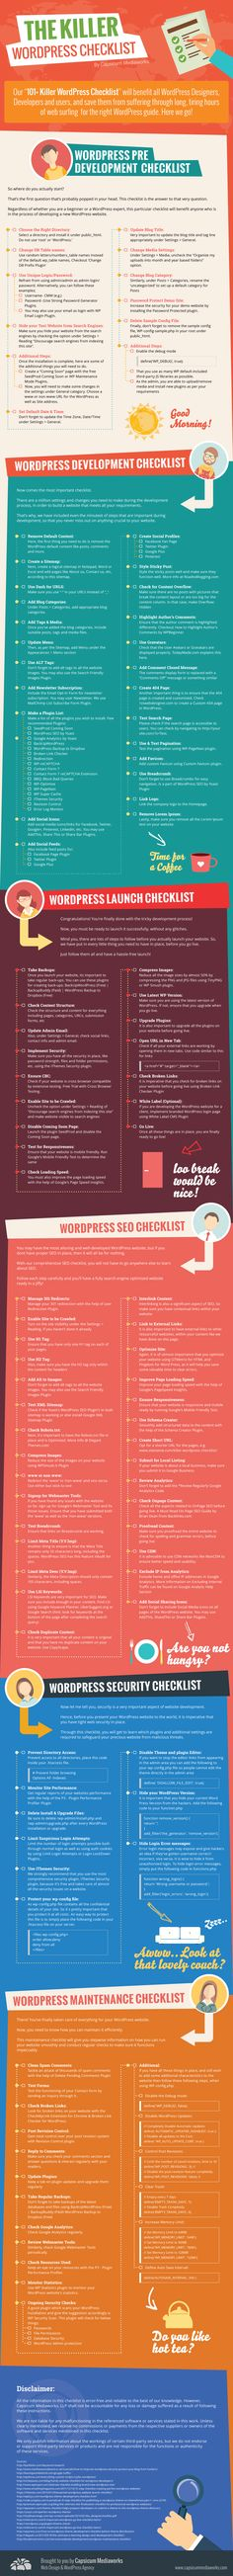 The Ultimate WordPress Checklist For Starting Your Next Website - Bluchic